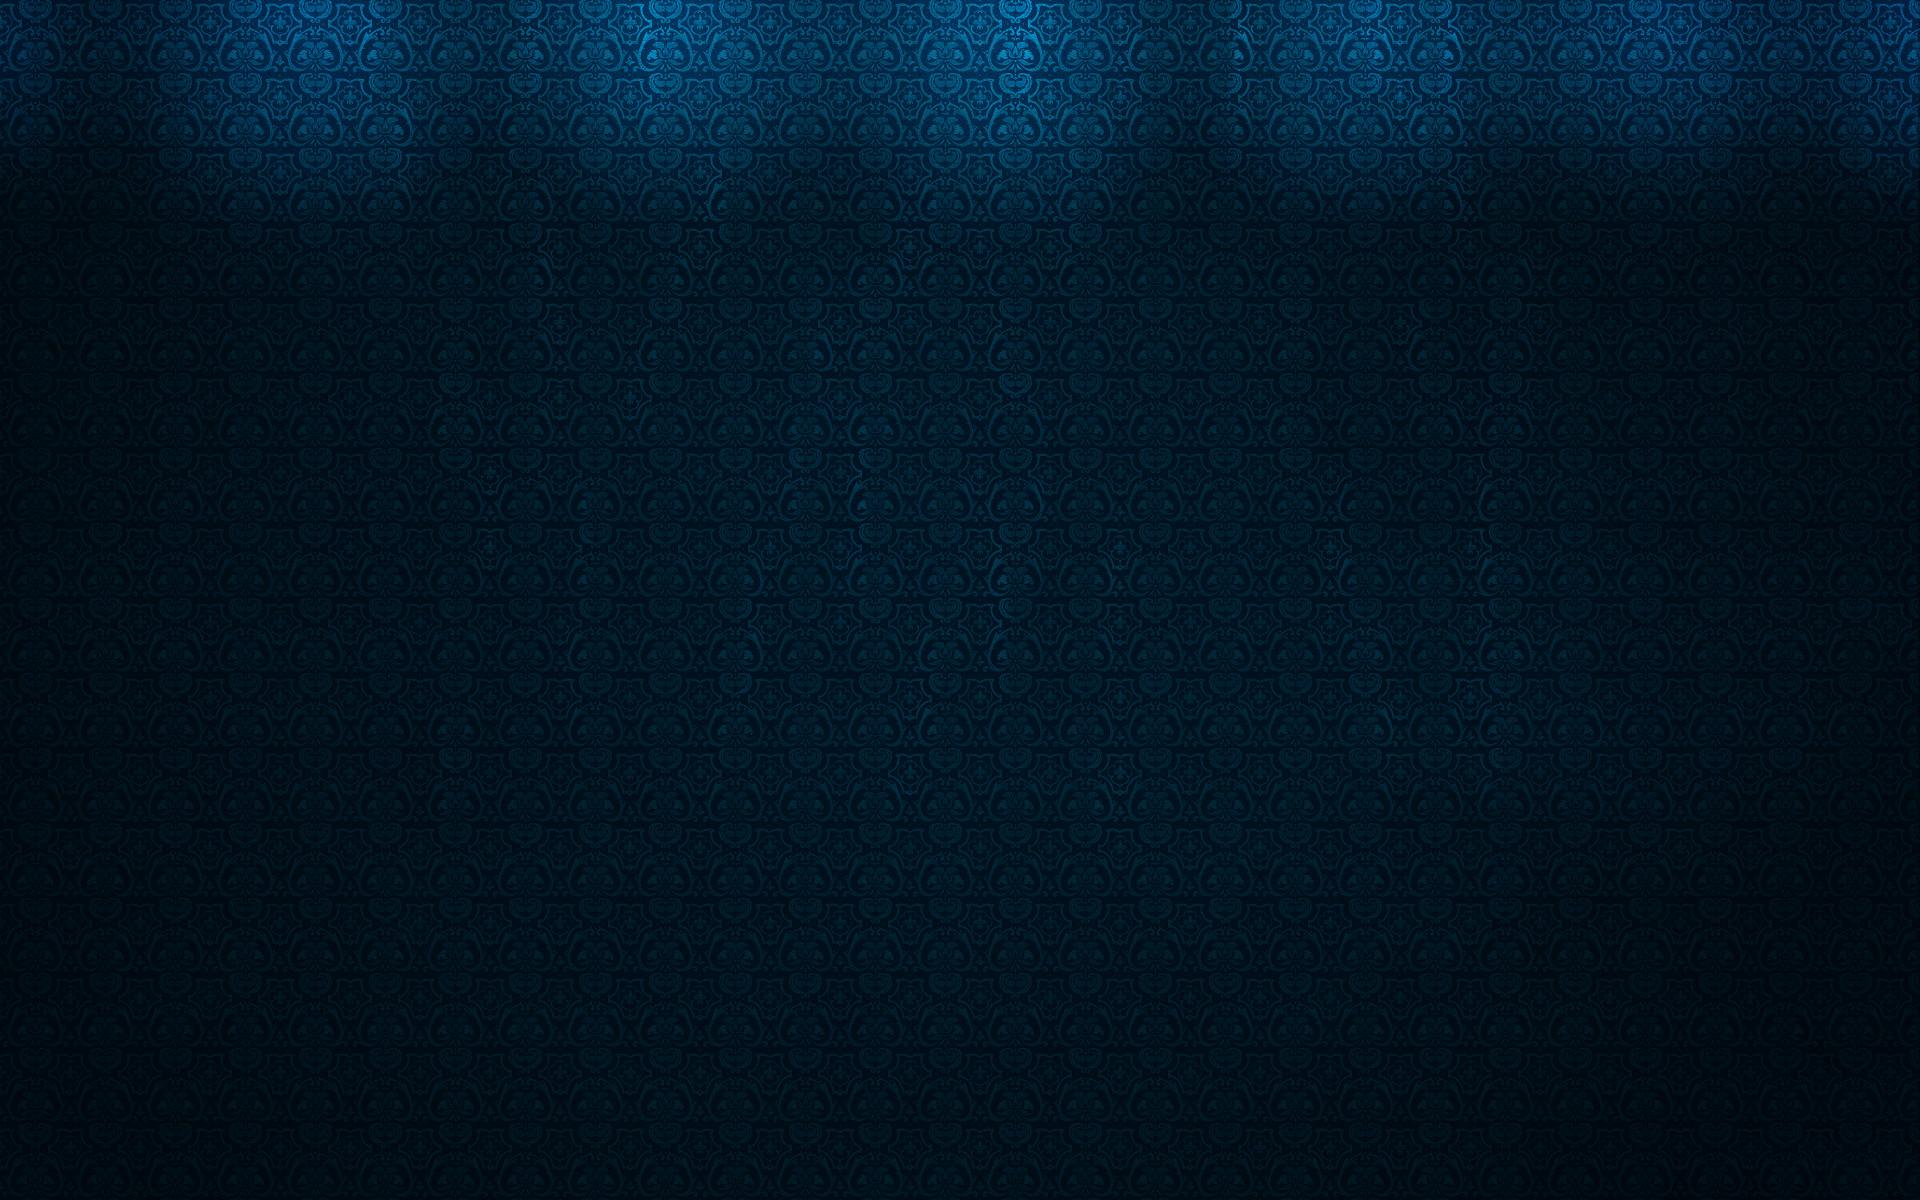 noir blue dark desktop wallpaper download noir blue dark wallpaper in .